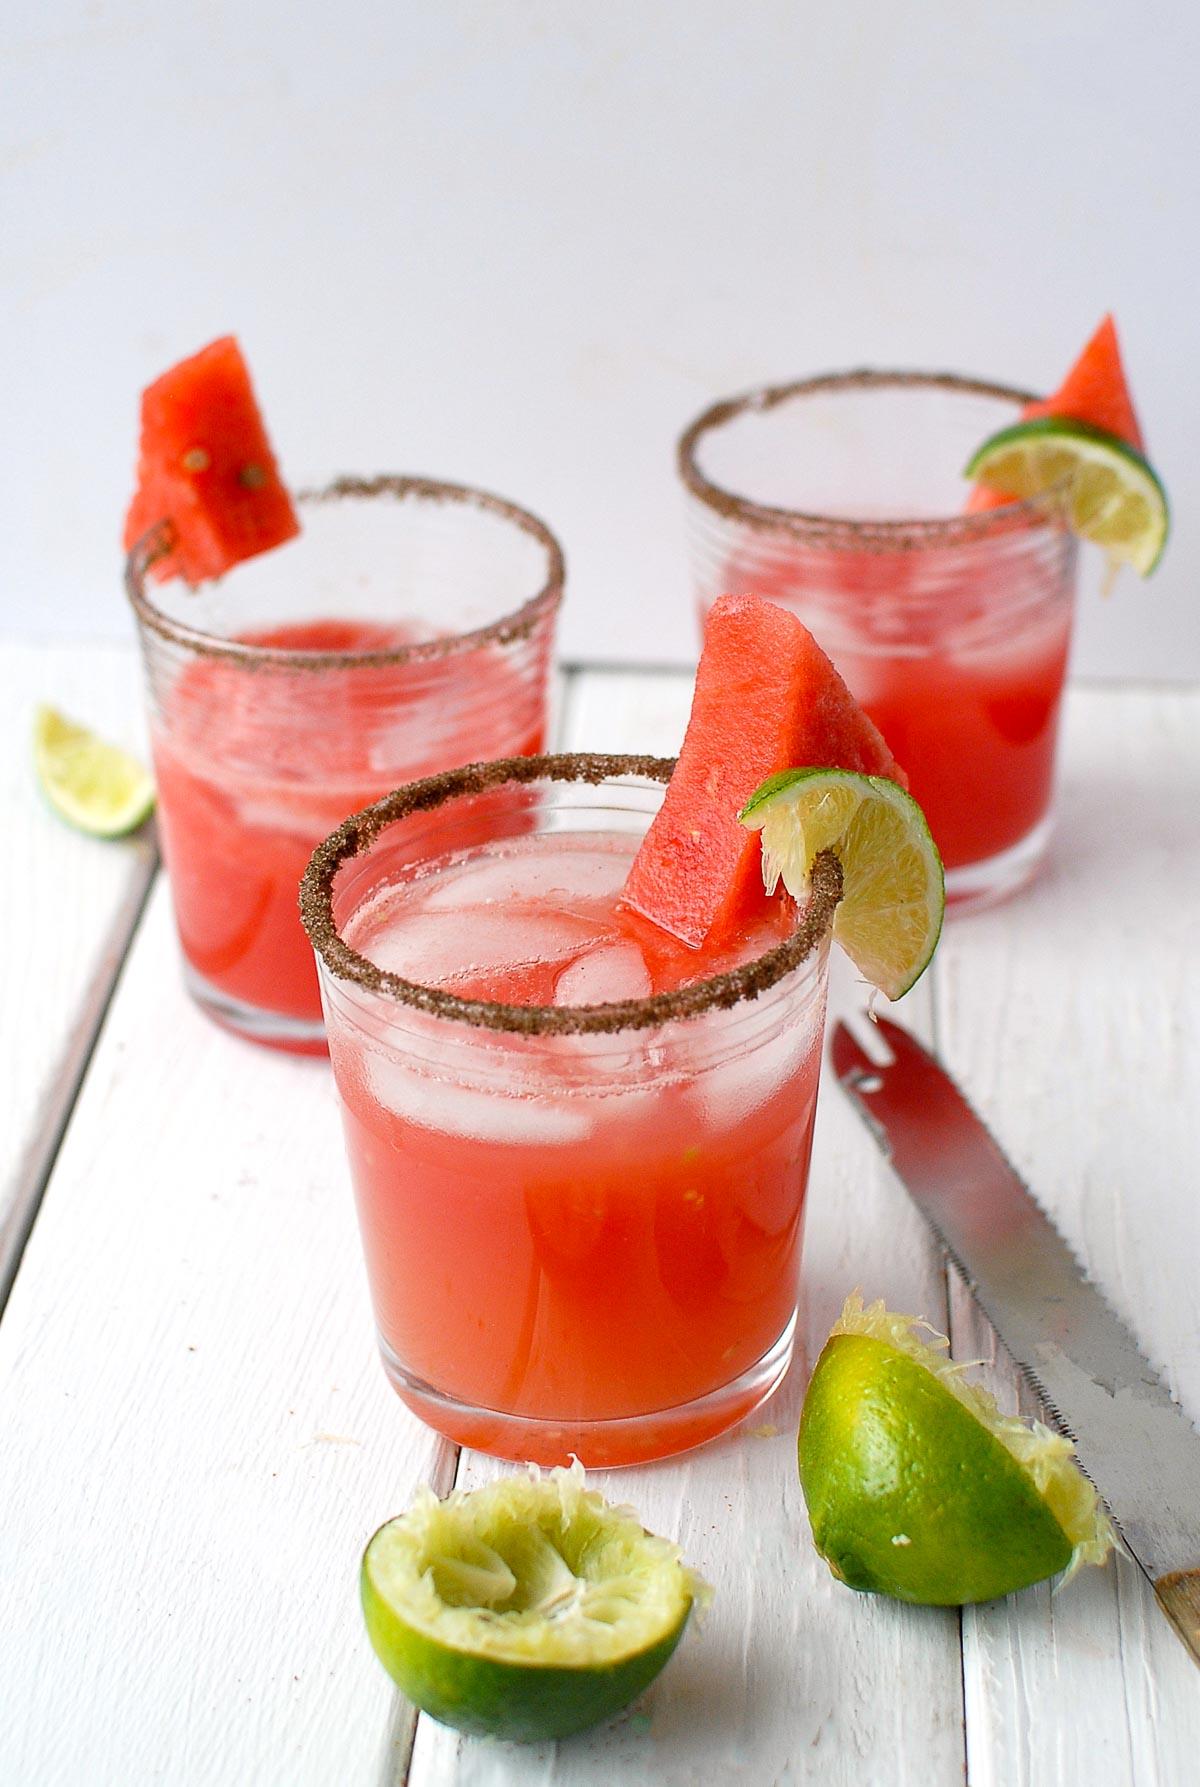 watermelon jalapeno margarita 3 glasses